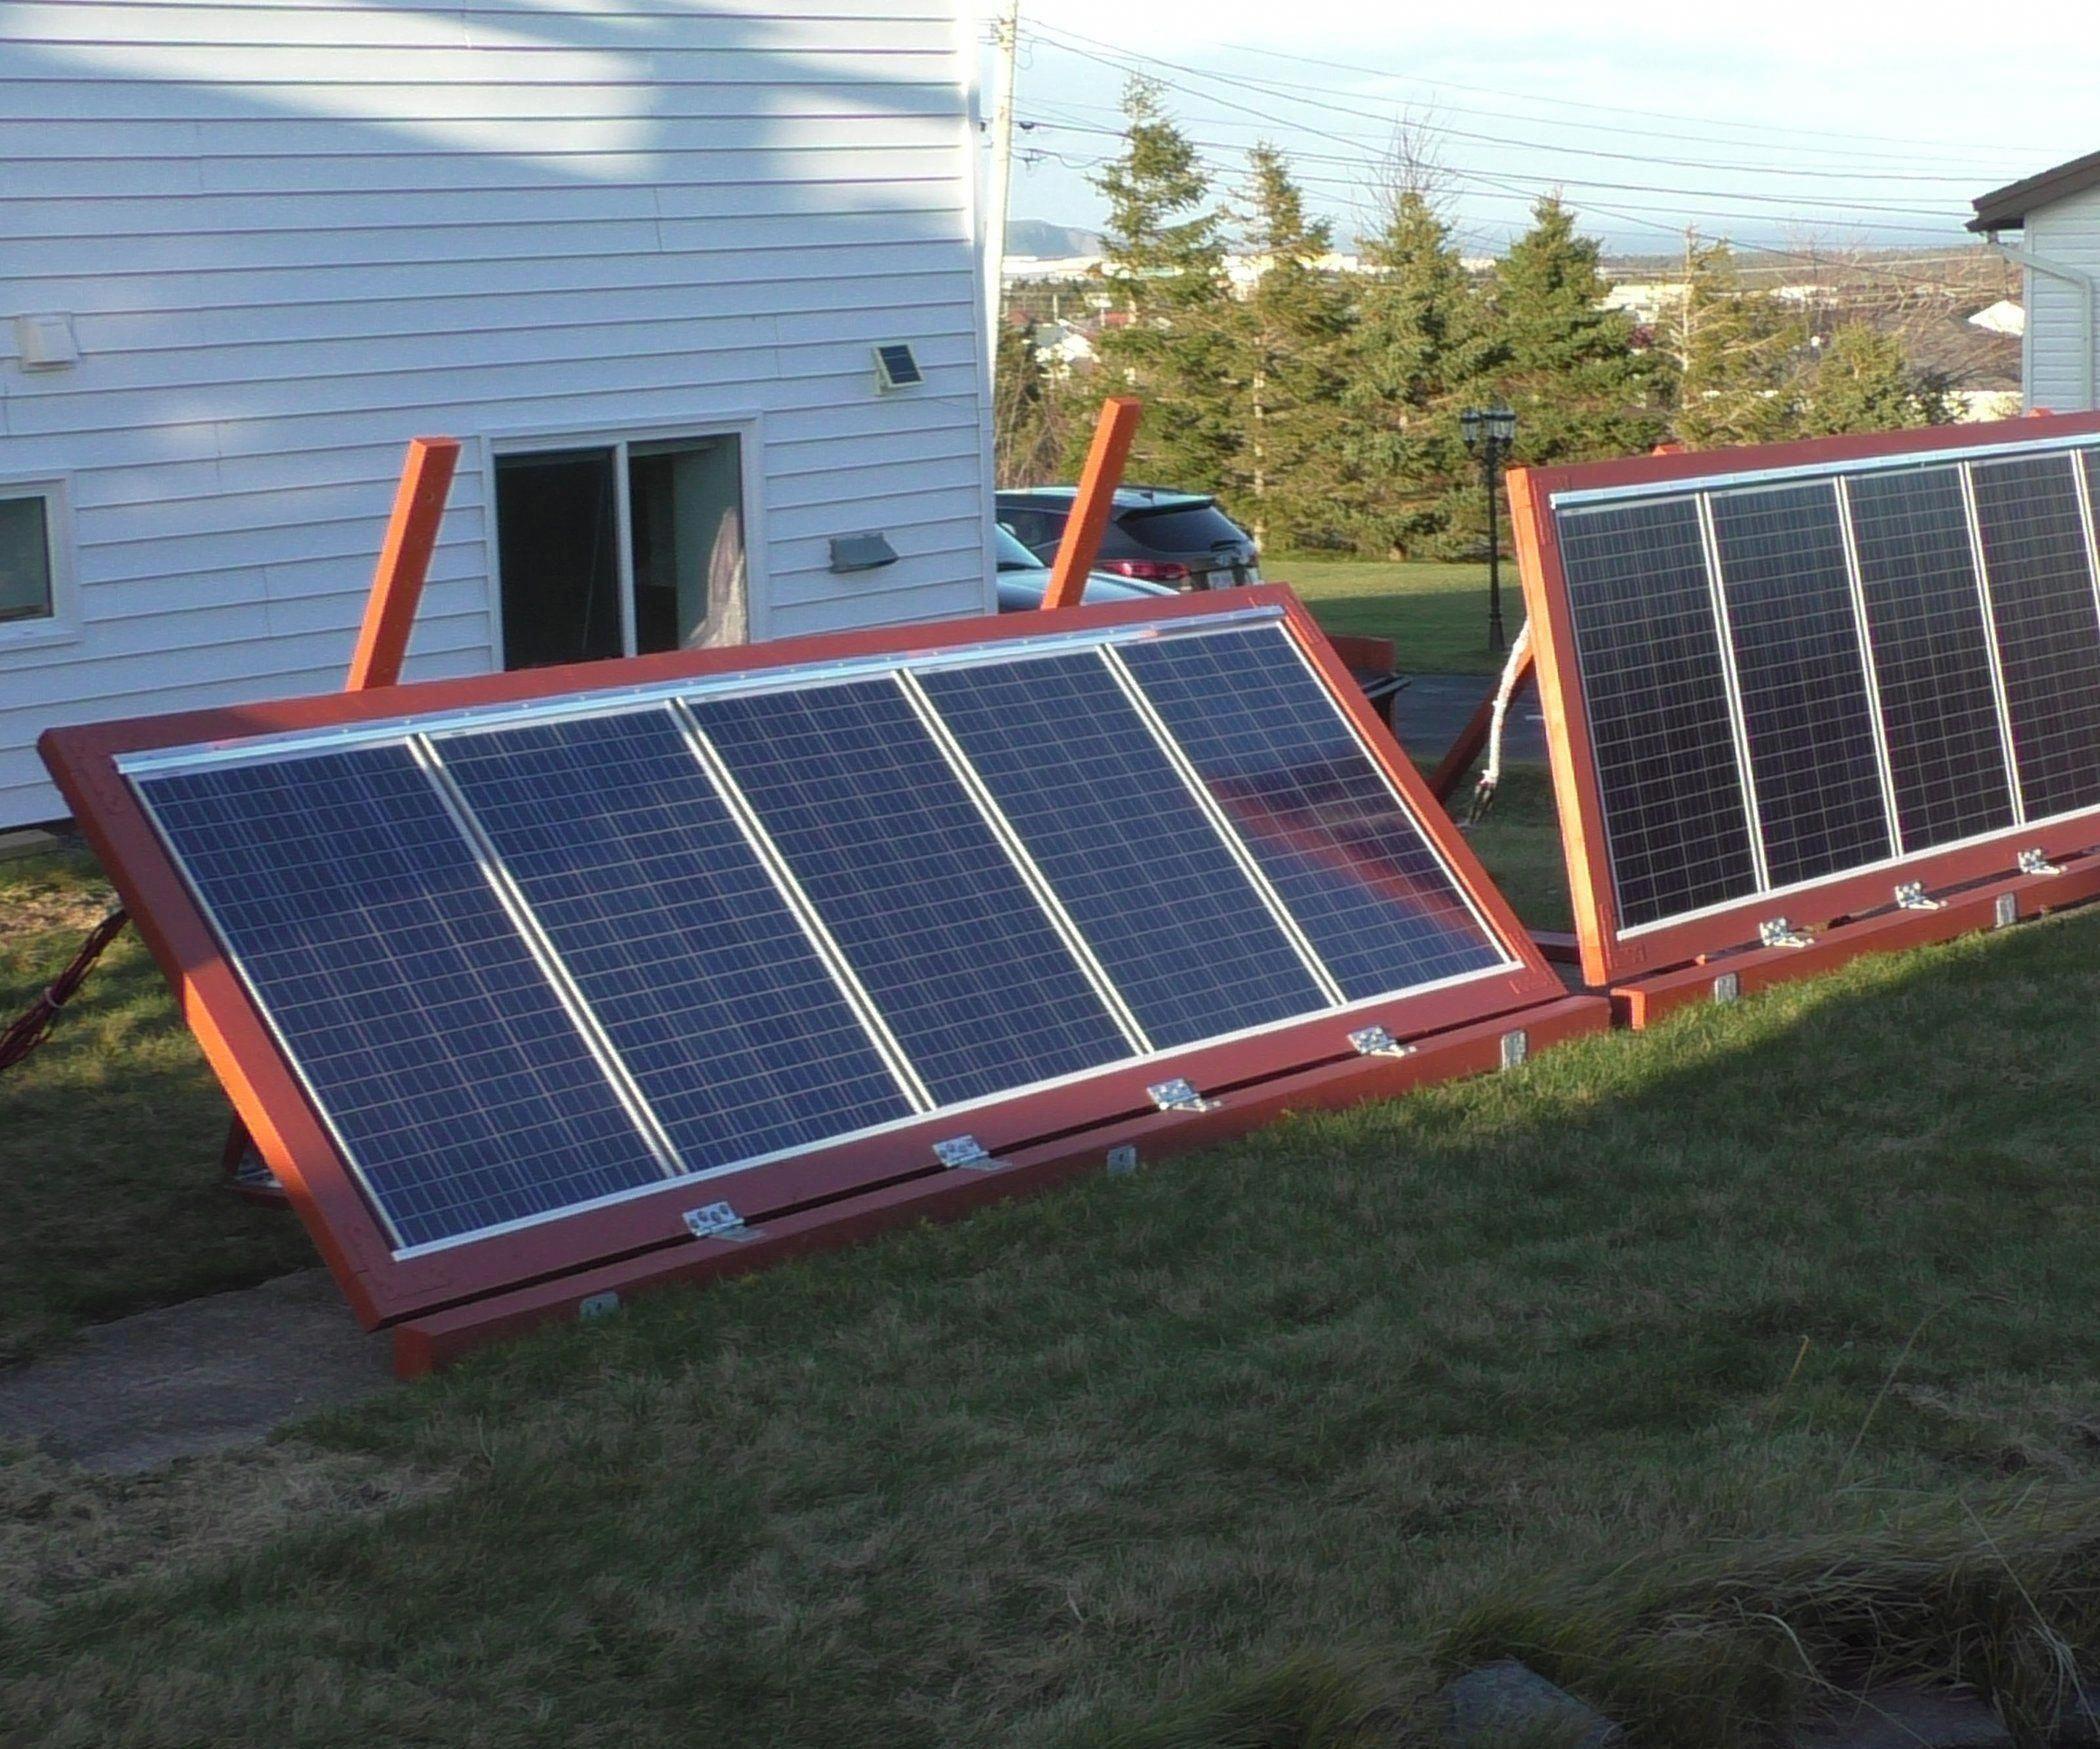 Ground Mounted Solar Panels With Adjustable Angles Solarpanels Solarenergy Solarpower Solargenerator Solarp In 2020 Best Solar Panels Solar Panels Solar Energy Panels